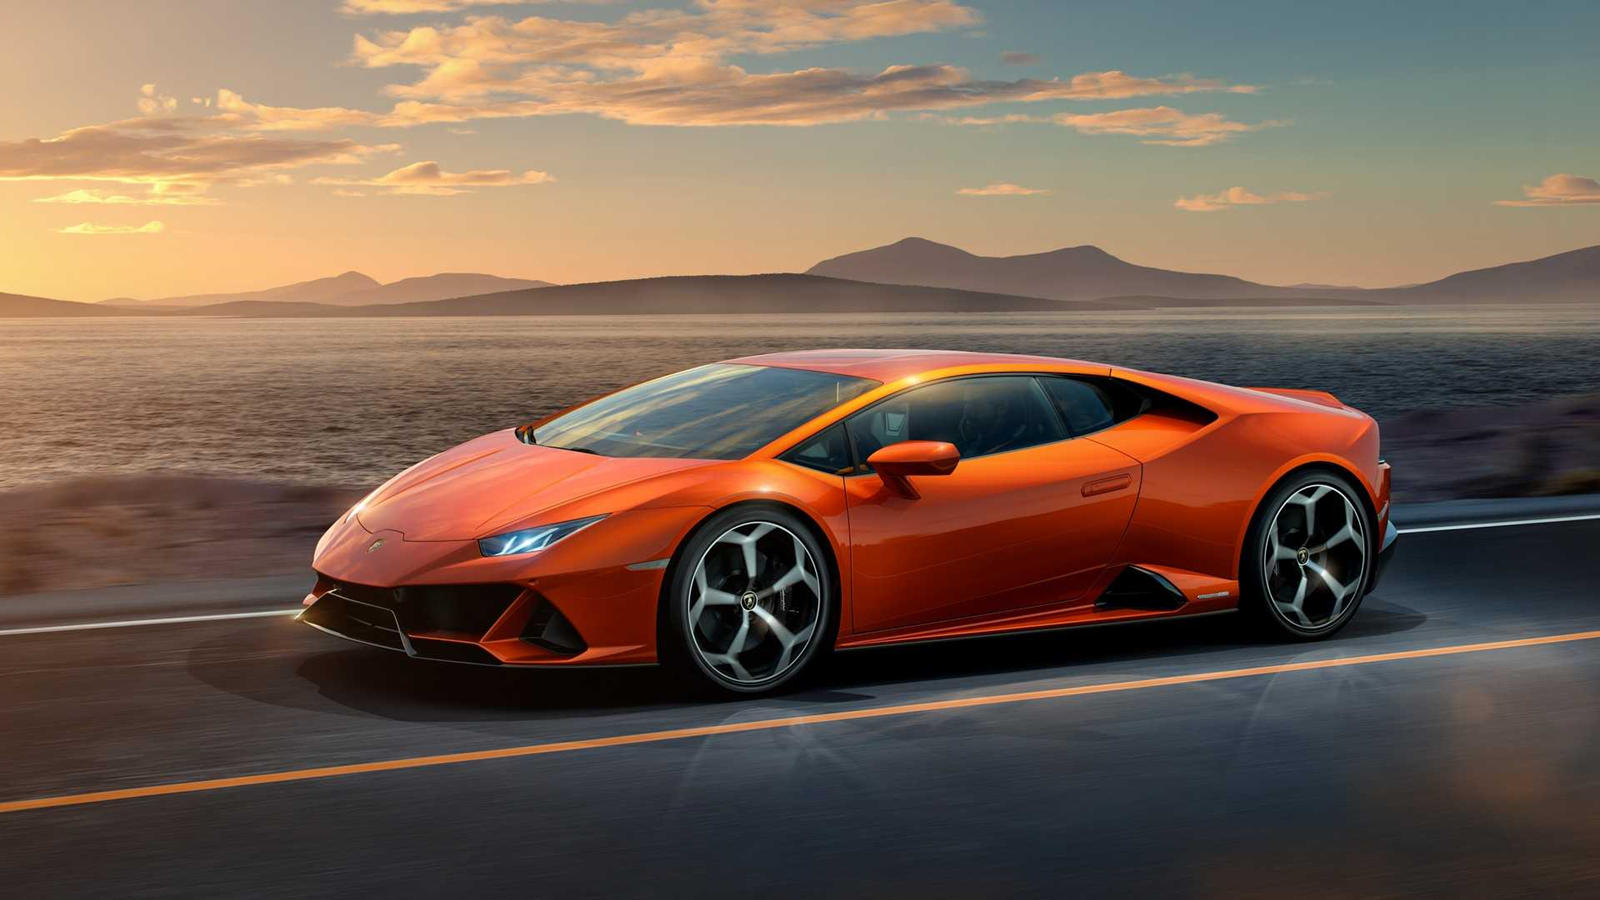 Say Hello To The New Lamborghini Huracan Evo Carbuzz